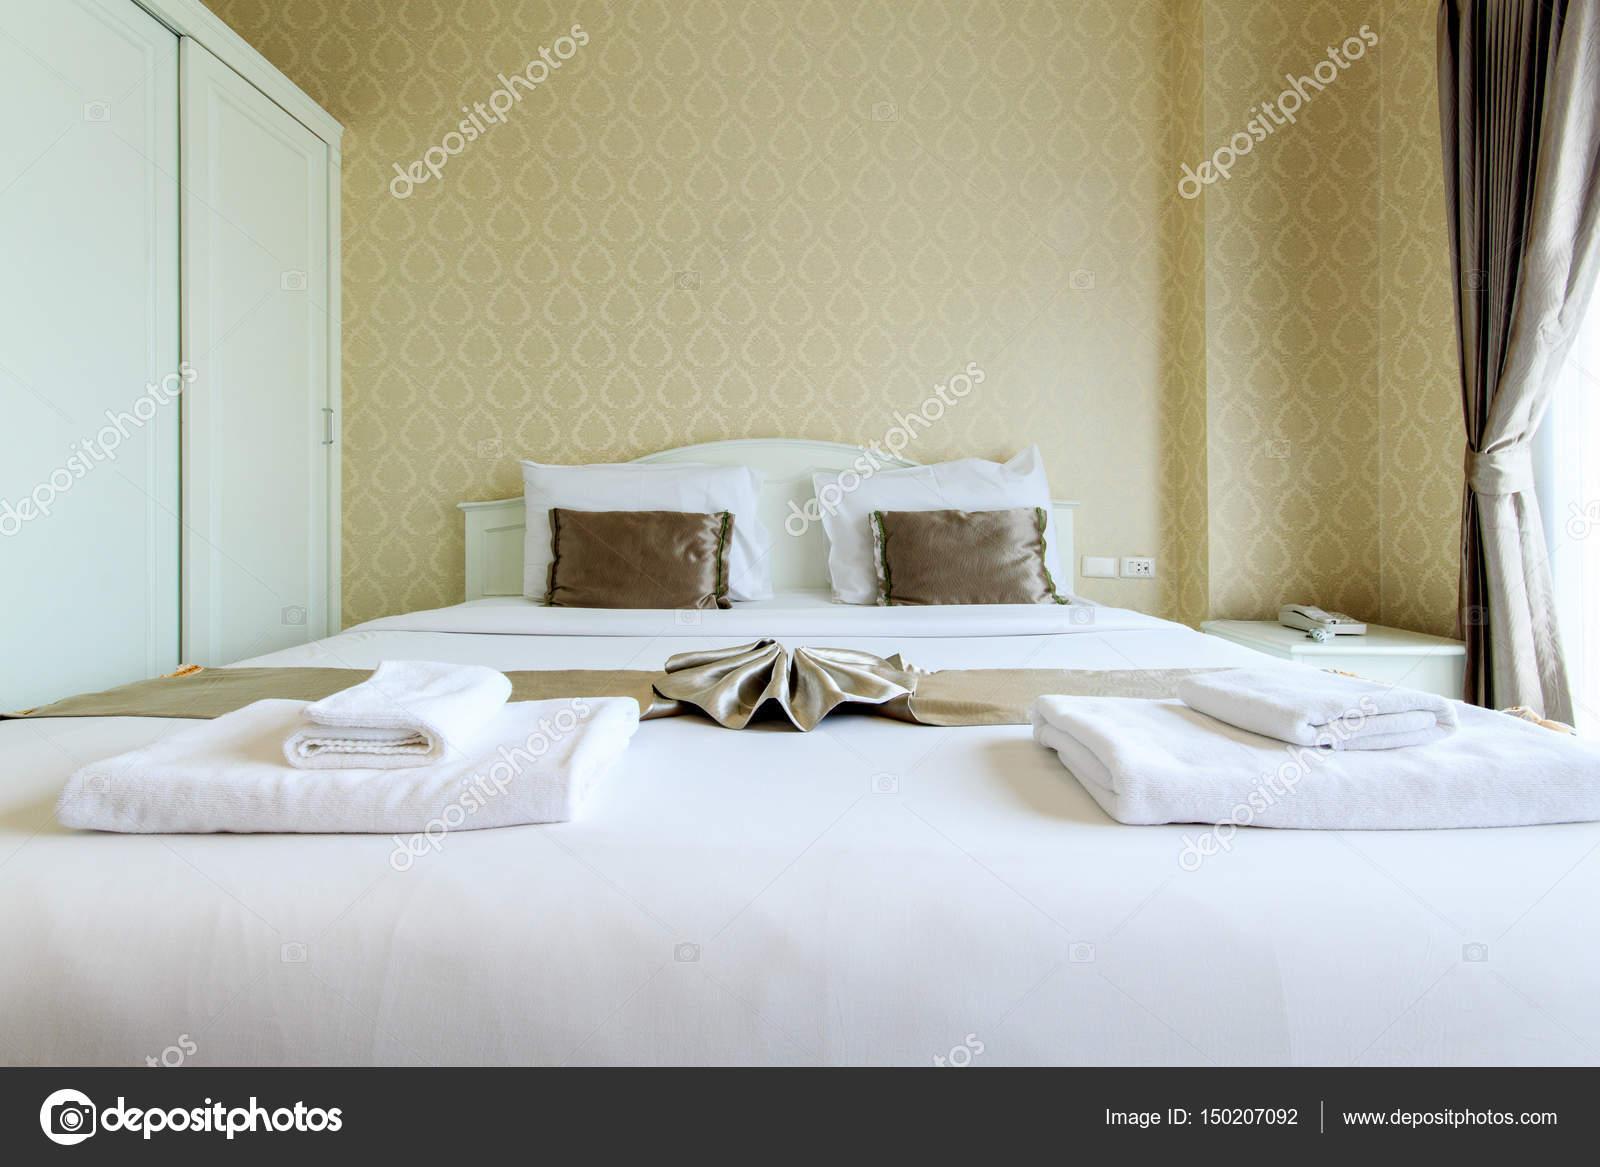 Camera stile country inglese — Foto Stock © Southtownboy #150207092